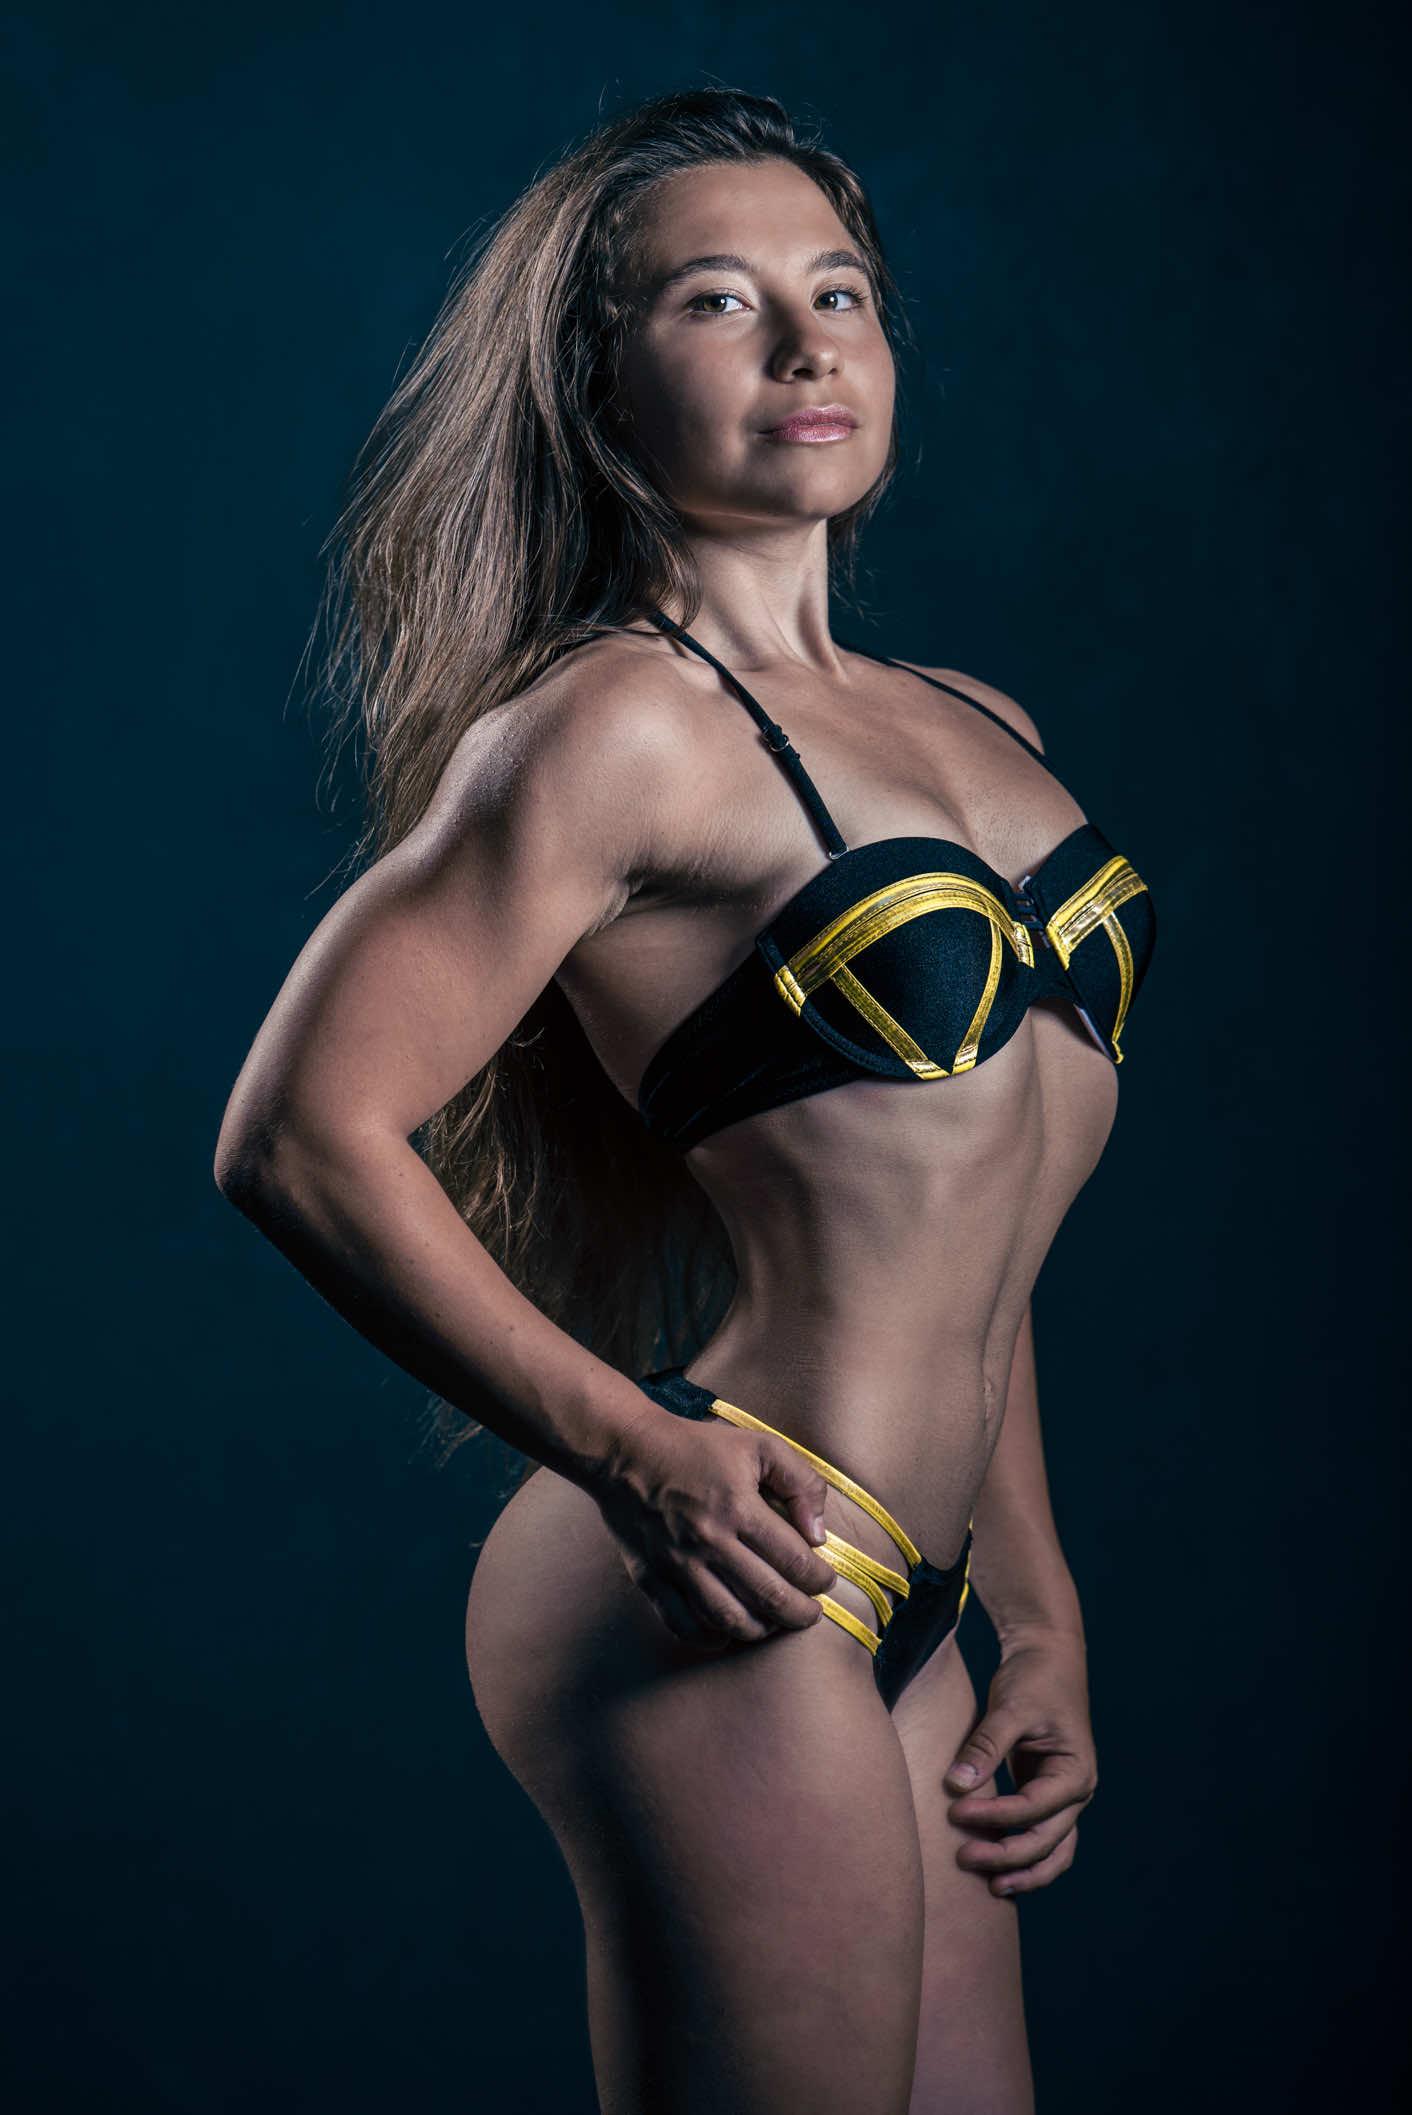 fotografo-fitness-ragazza-bikini-palestra